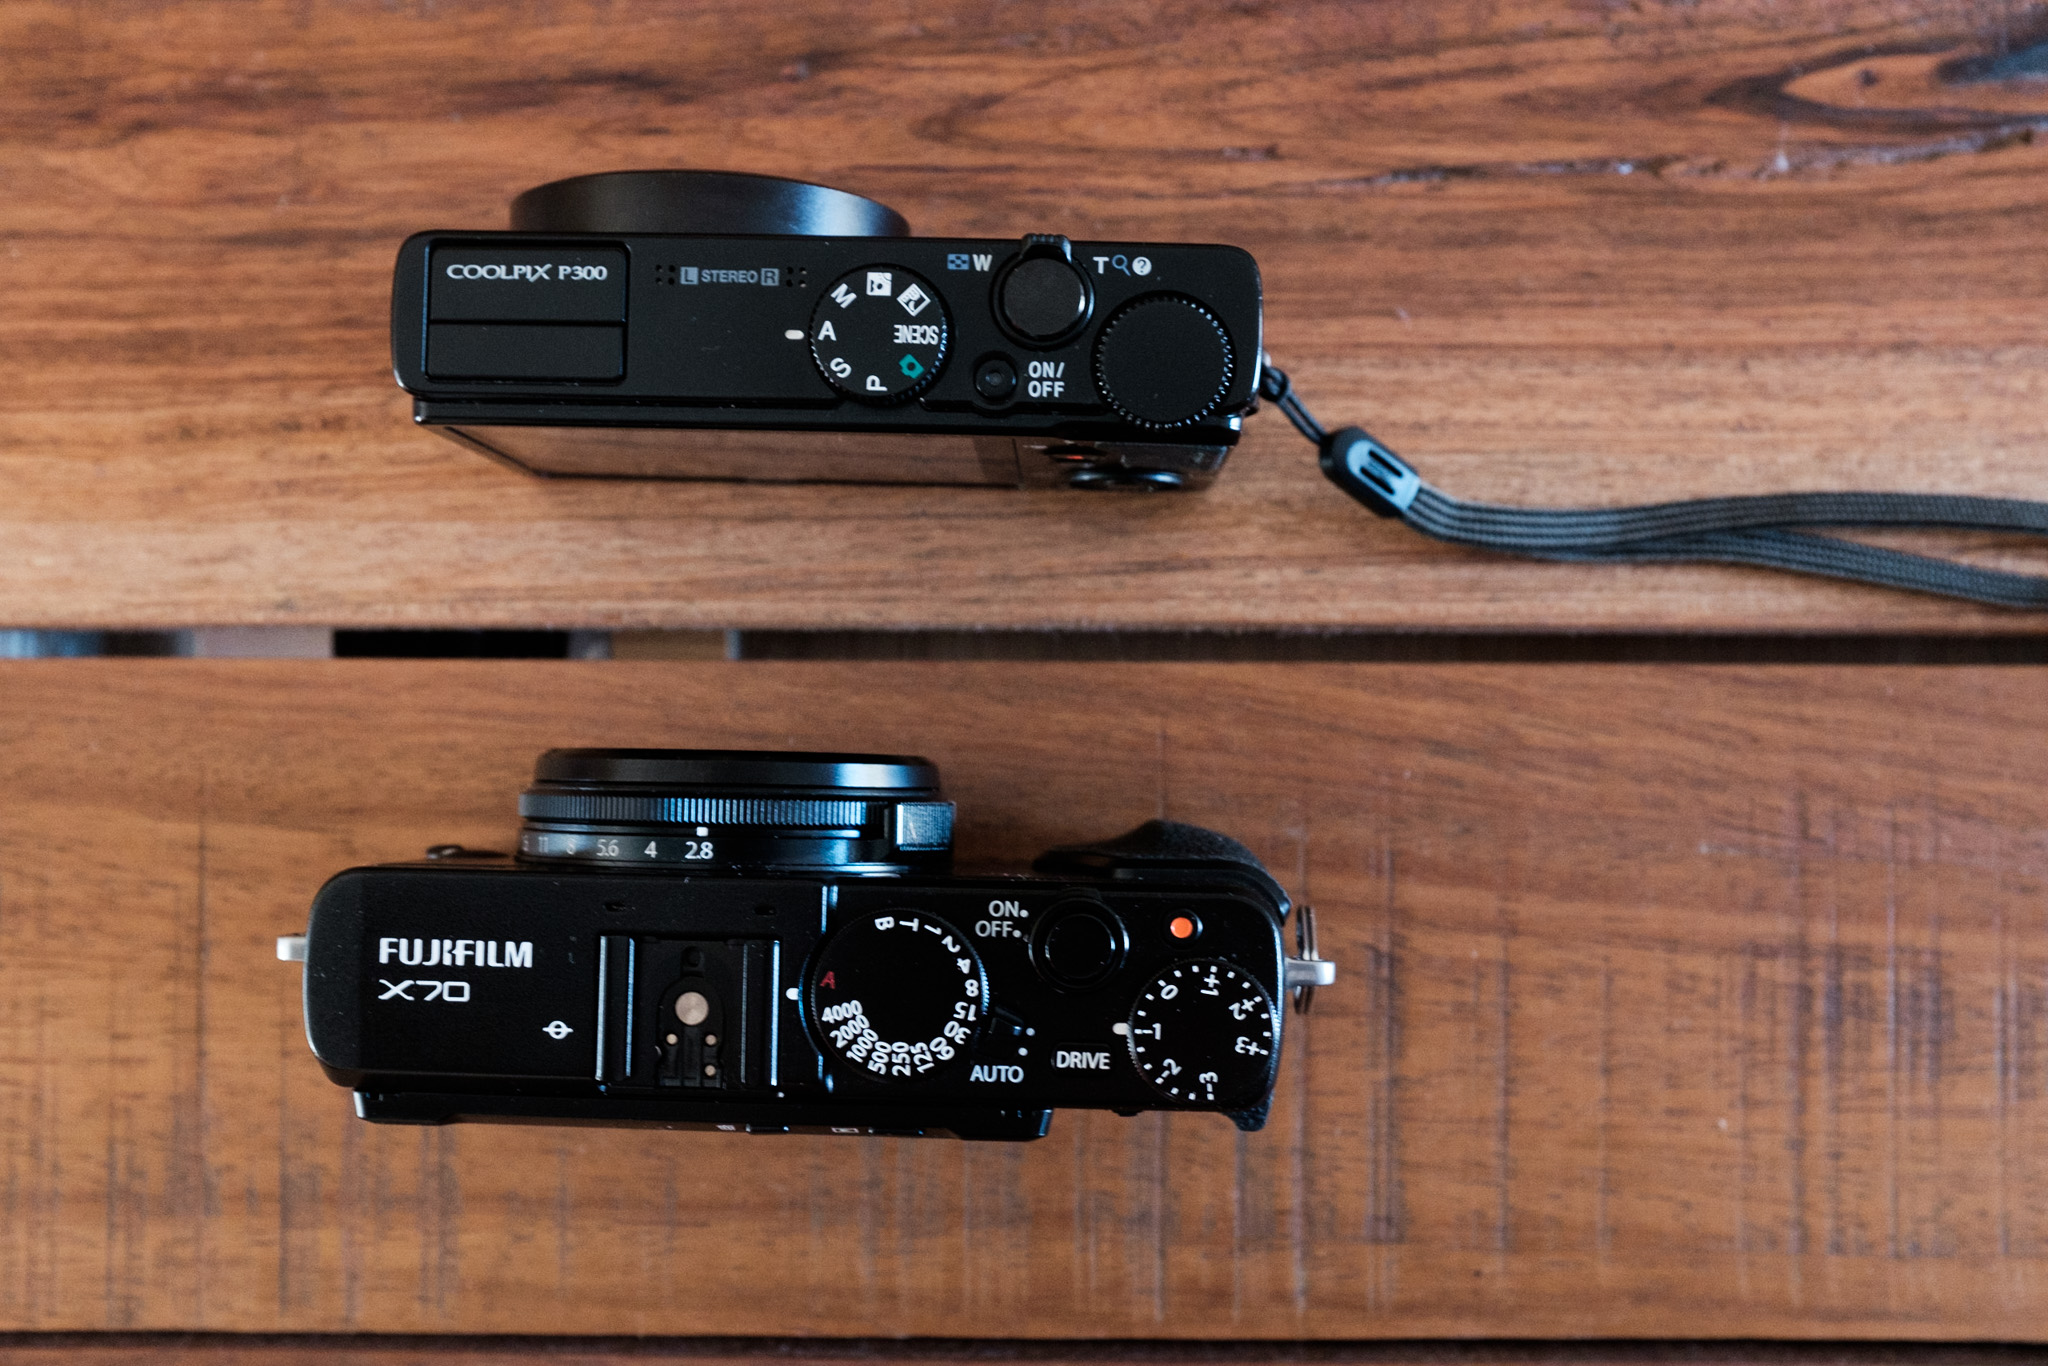 Fuji X-70 vs Nikon P300